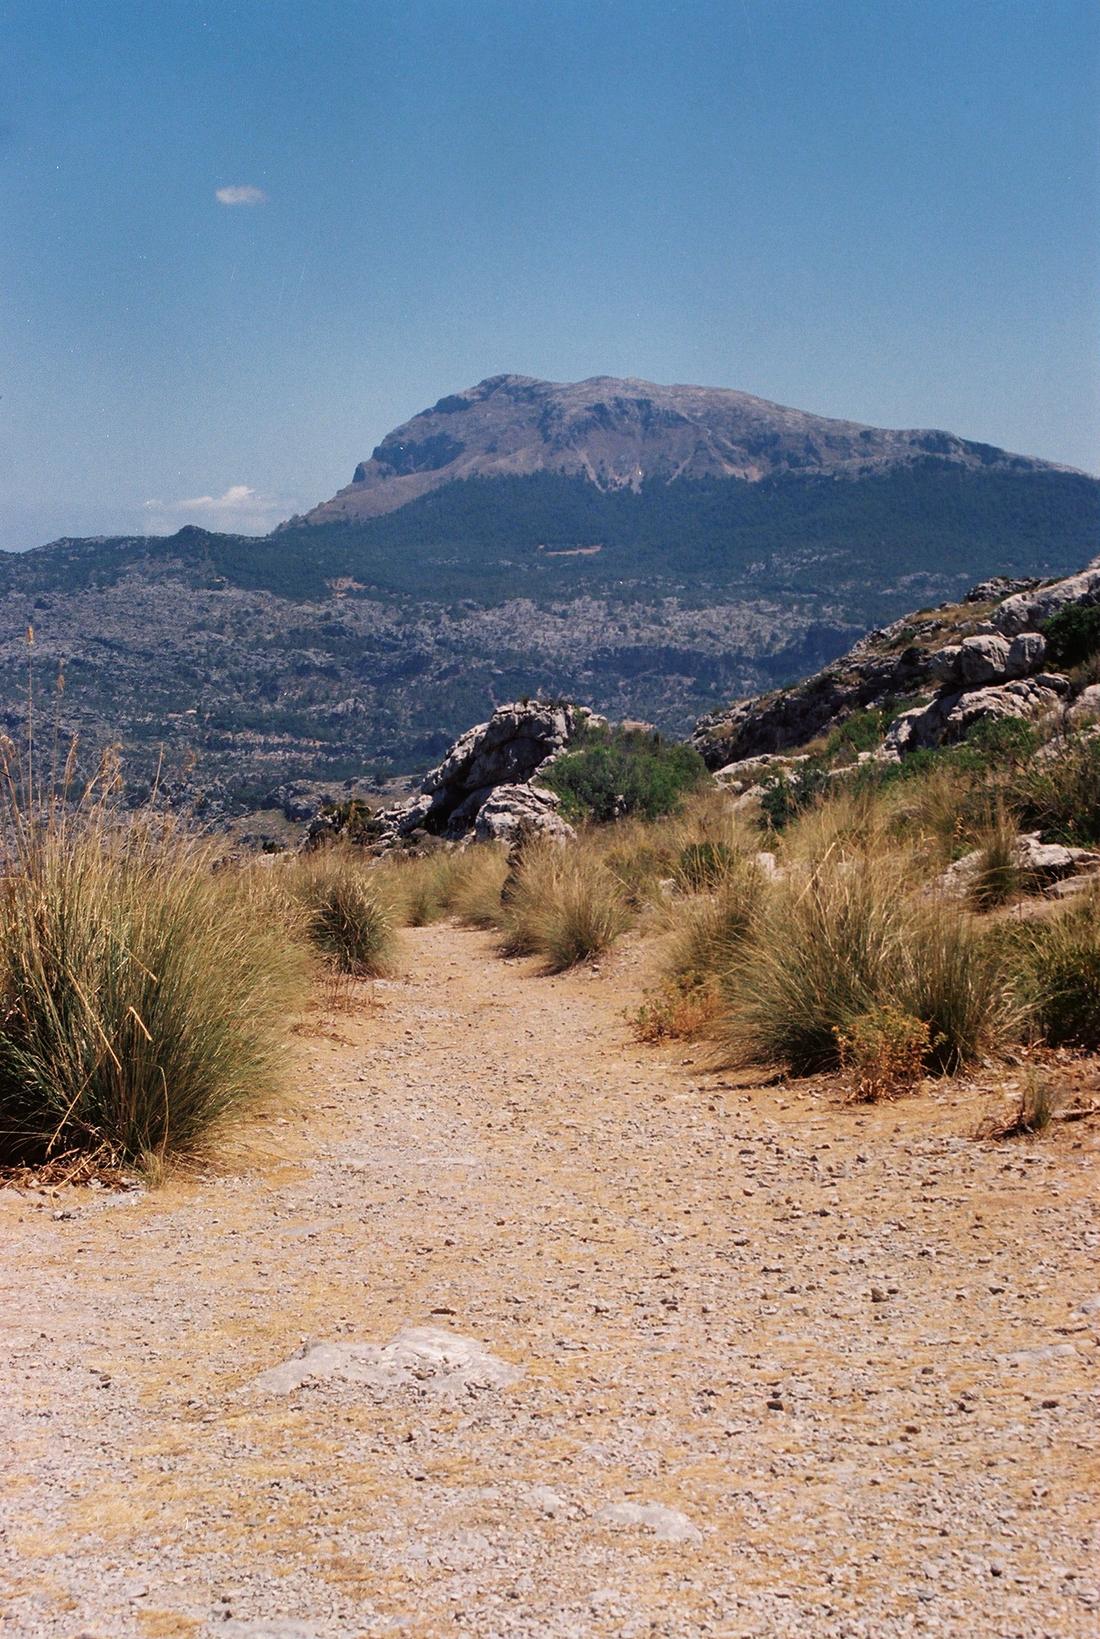 Highest mountain Puig Major in the Serra de Tramuntana mountain range on the island of Mallorca